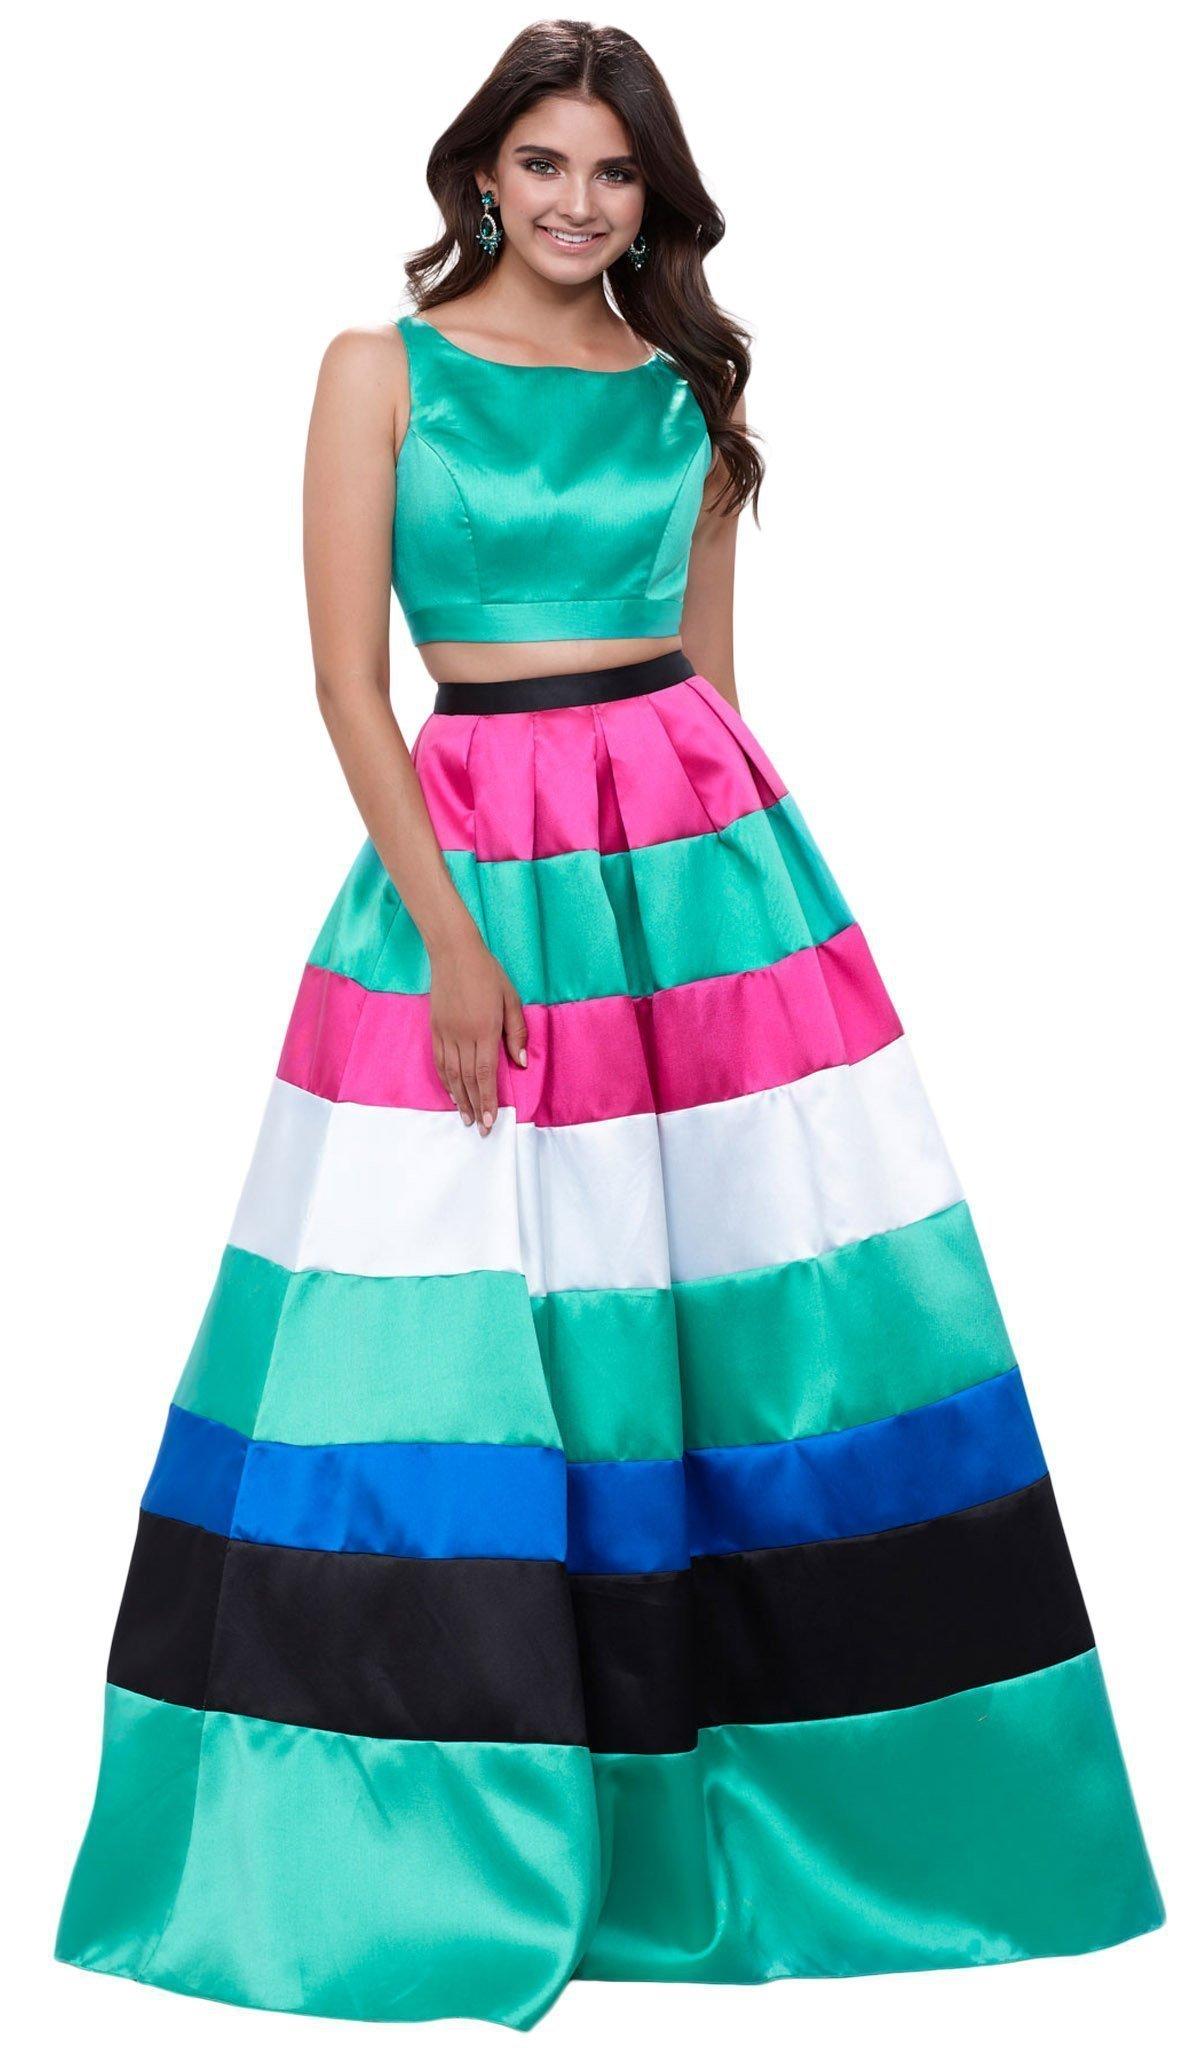 Nox Anabel - 8335 Two-Piece Bateau Mikado Evening Dress